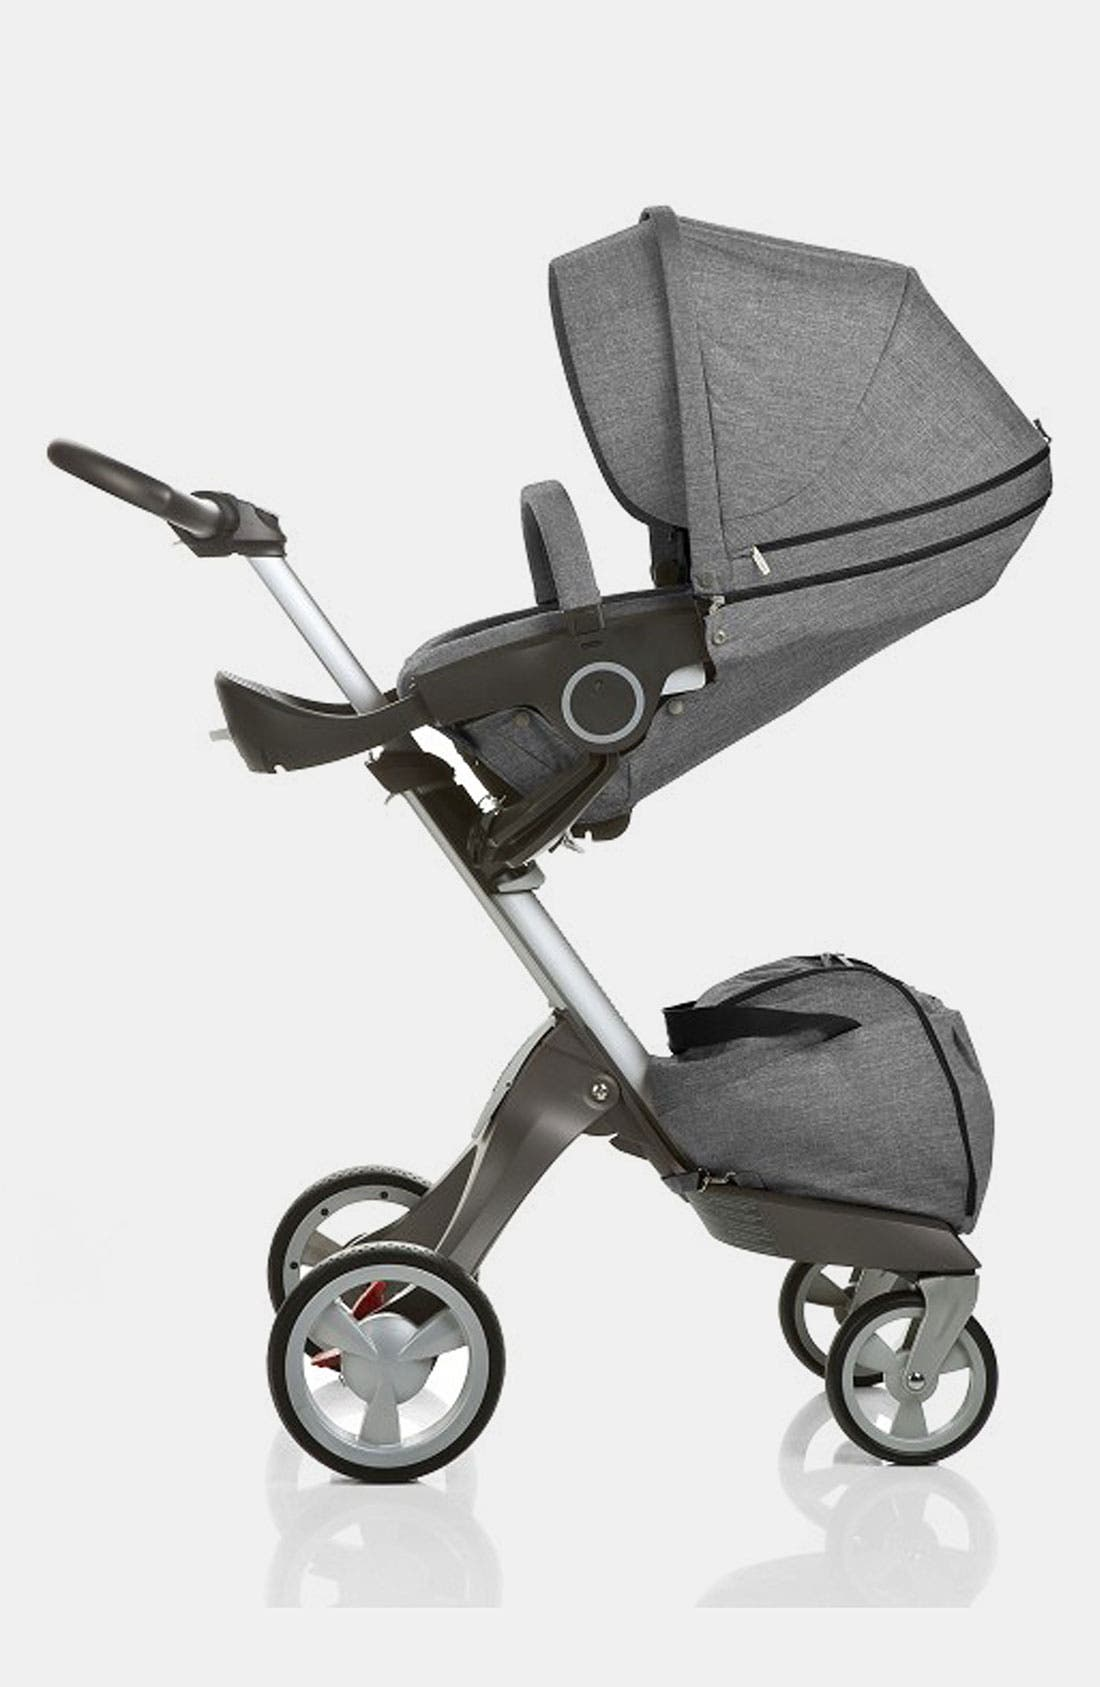 Stokke 'Xplory' Stroller & Accessories